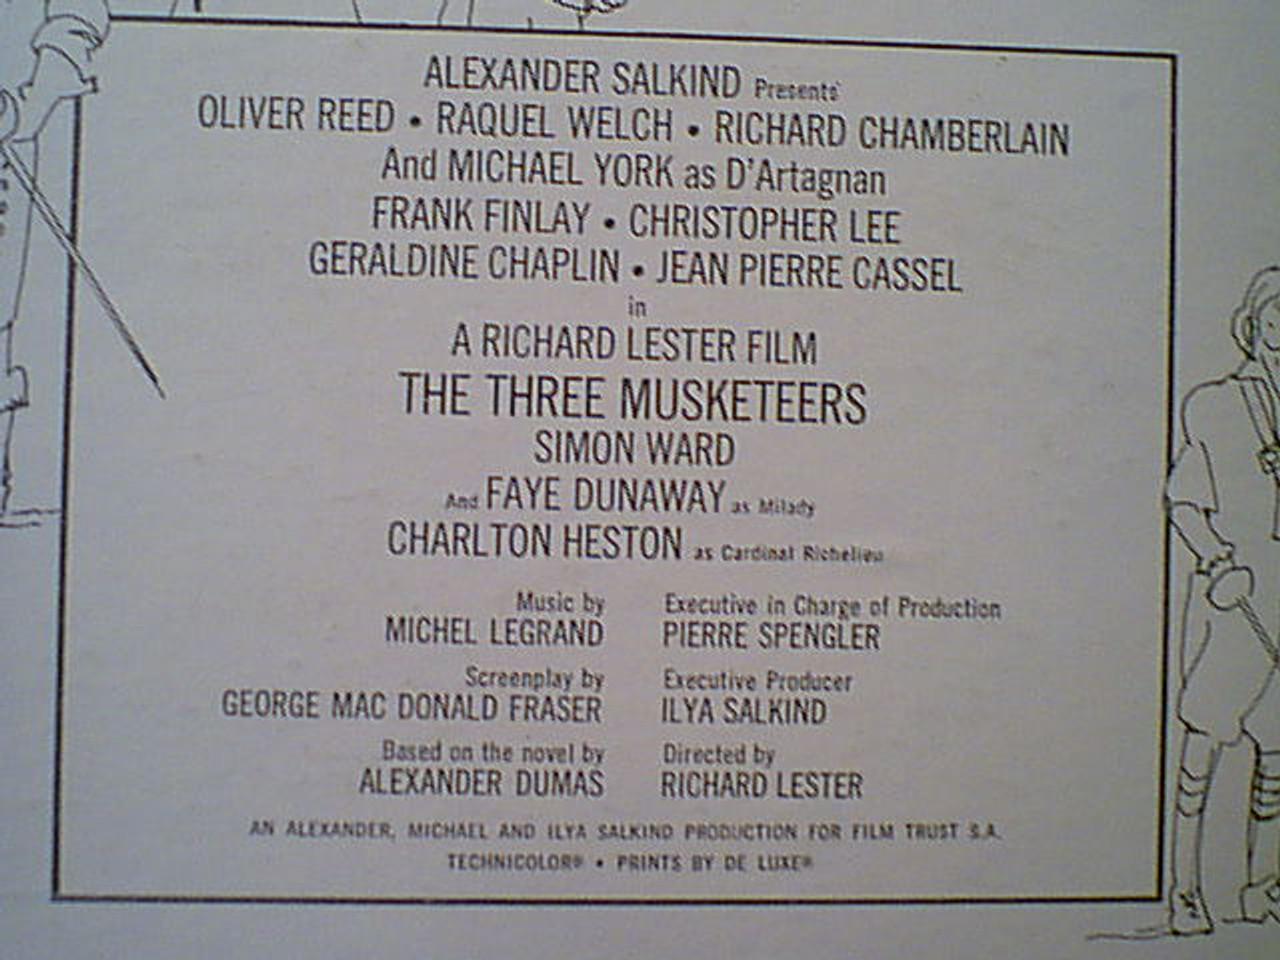 "Chamberlain, Richard Charlton Heston Michael York Raquel Welch ""The Three Musketeers"" 1974 LP Signed Autograph Color Photos"